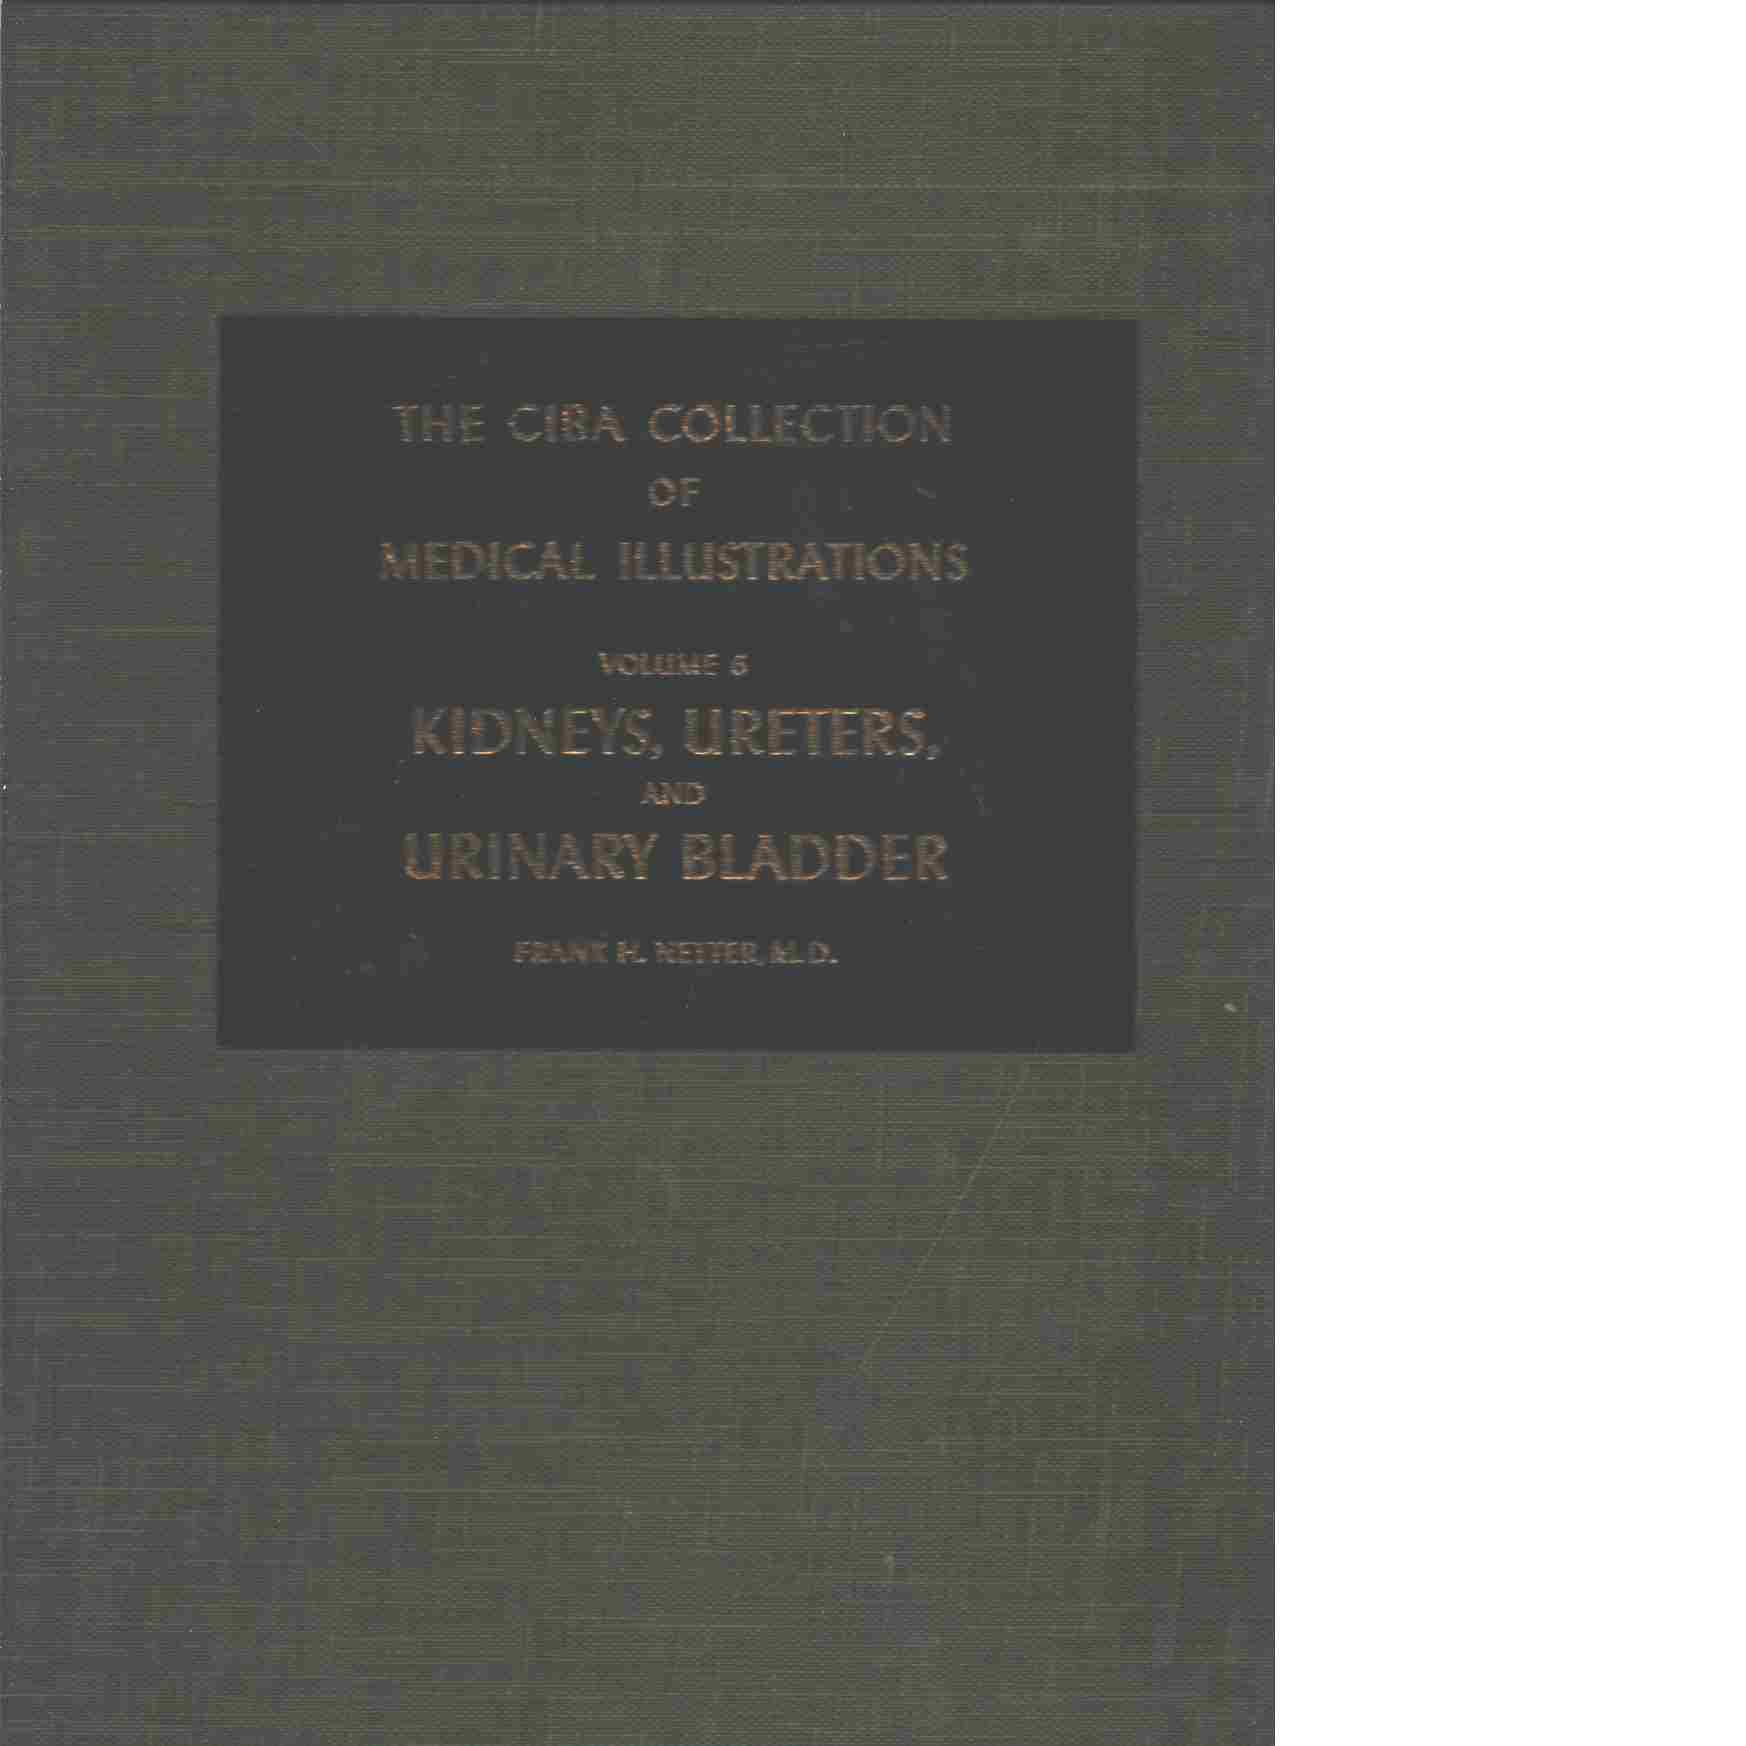 The Ciba Collection of Medical Illustrations, Volume 6 Kidneys, Ureters,Urinary Bladder - Netter Frank H.